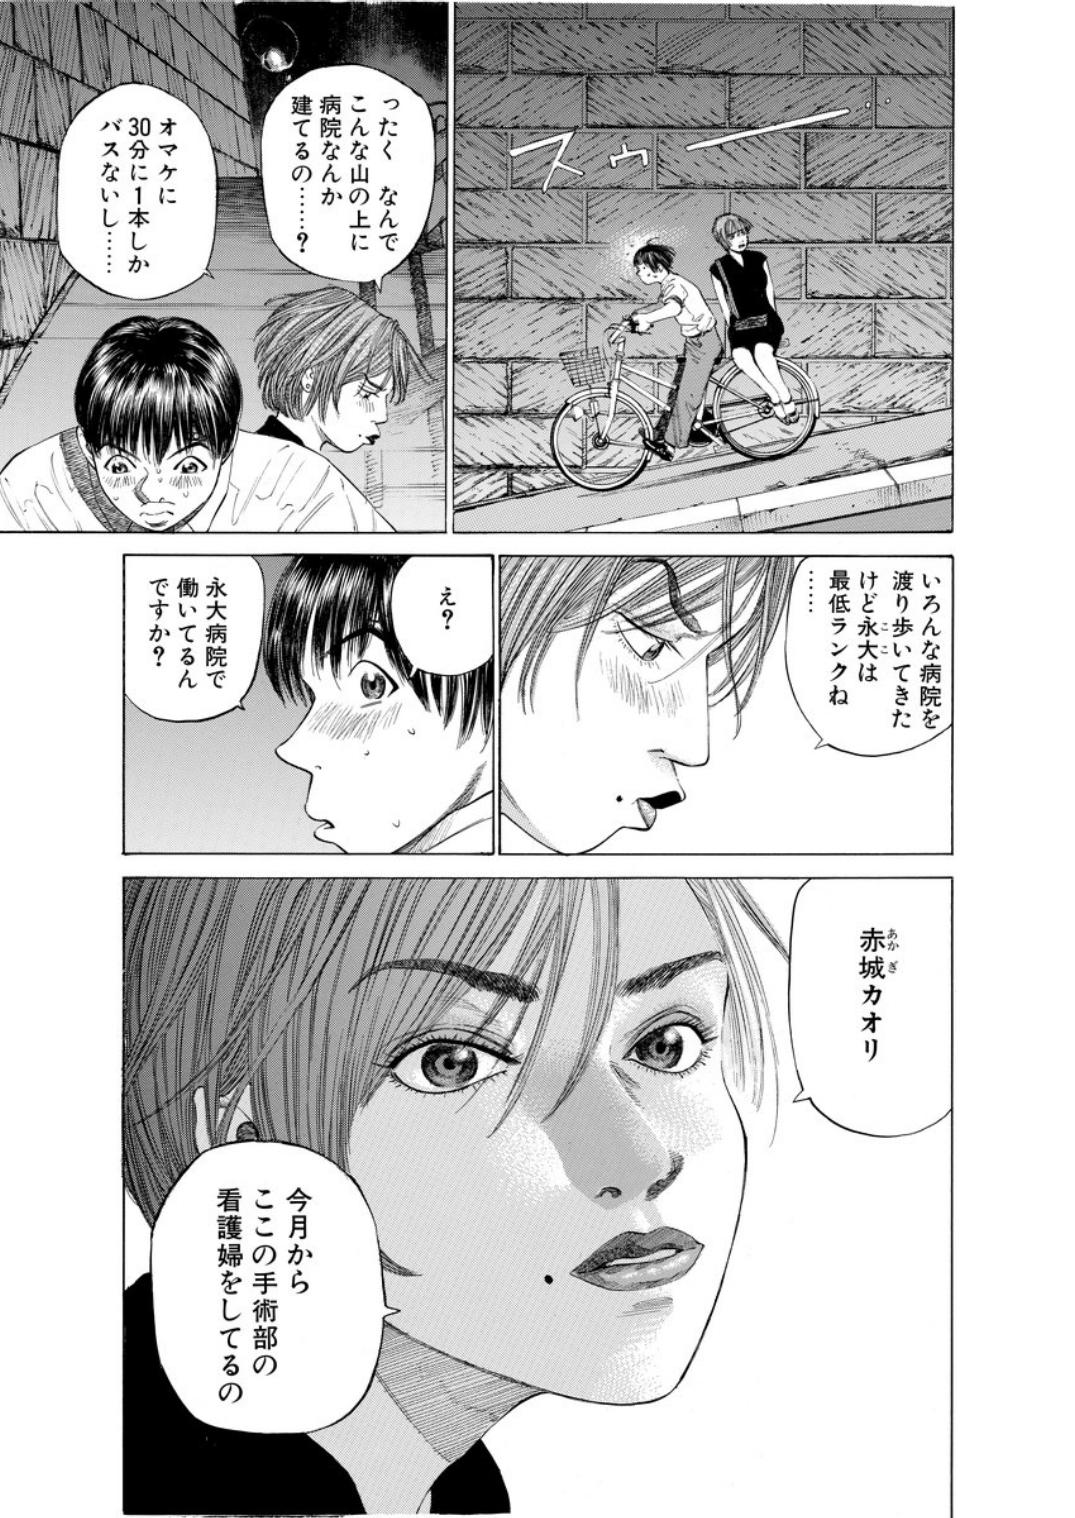 001bj_page-0203.jpg